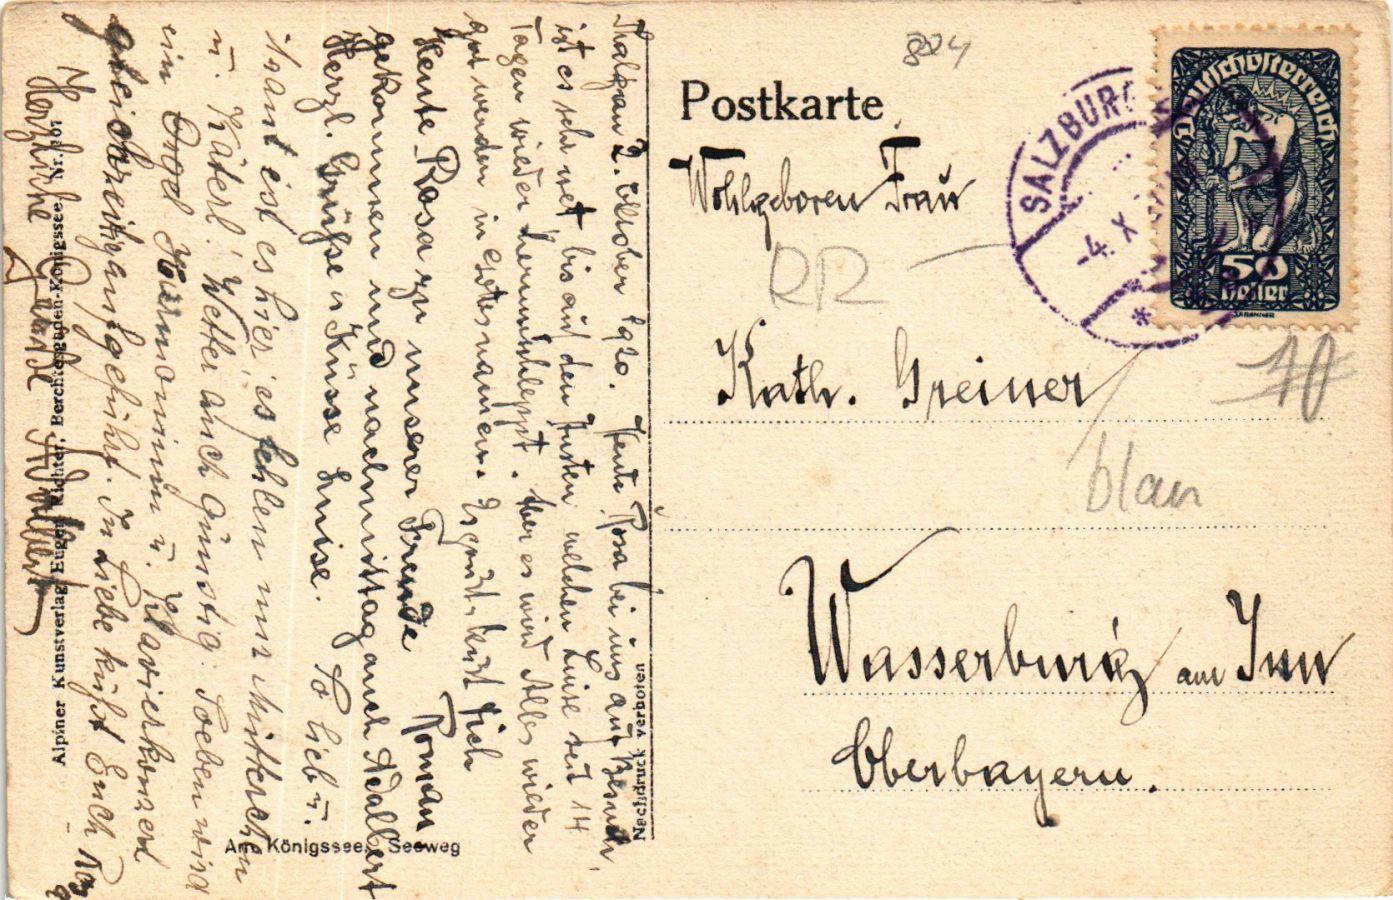 CPA-AK-Konigssee-Seeweg-GERMANY-878905 miniature 2